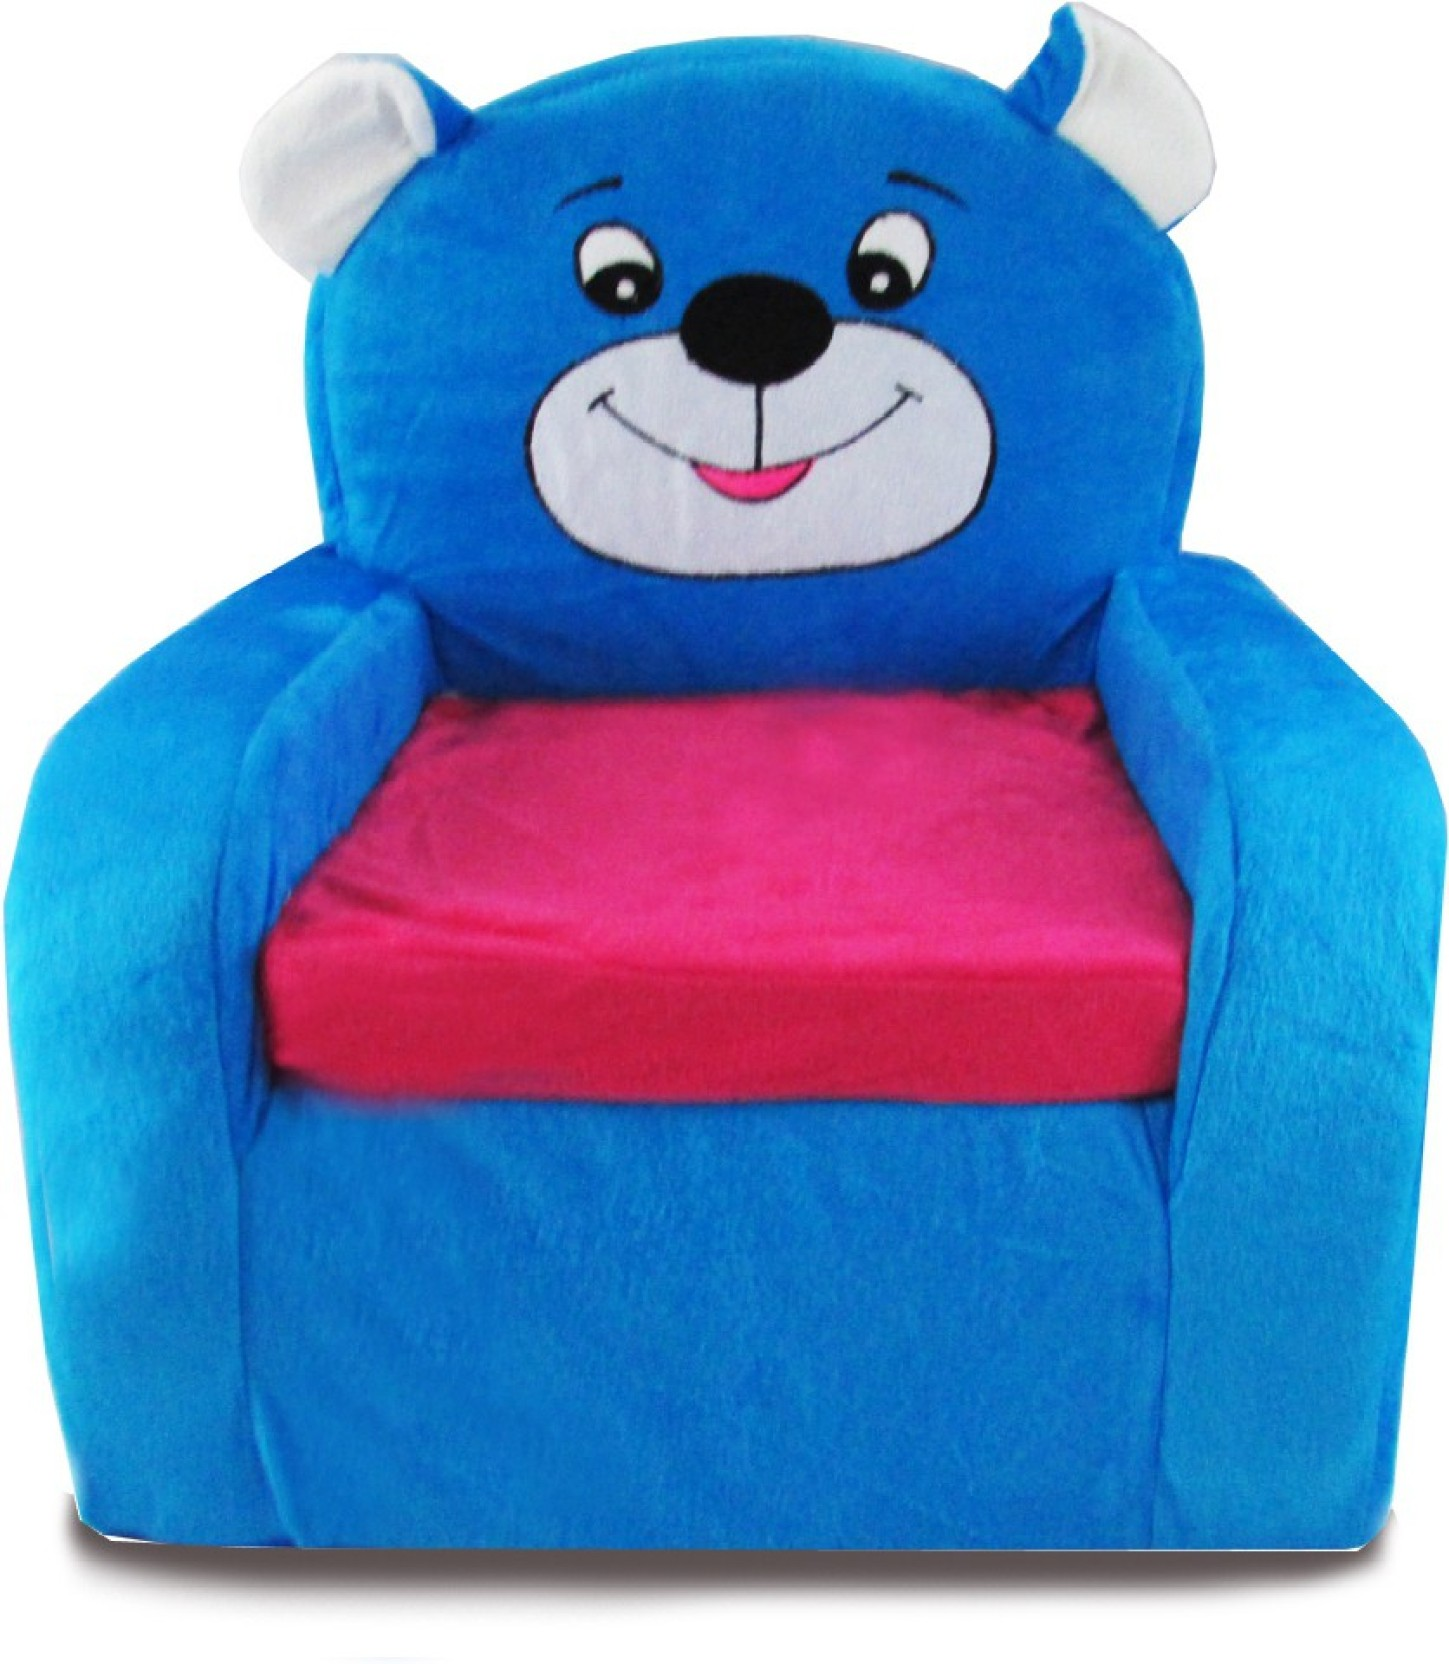 Tabby Toys Teddy Bear Thermocol Foam